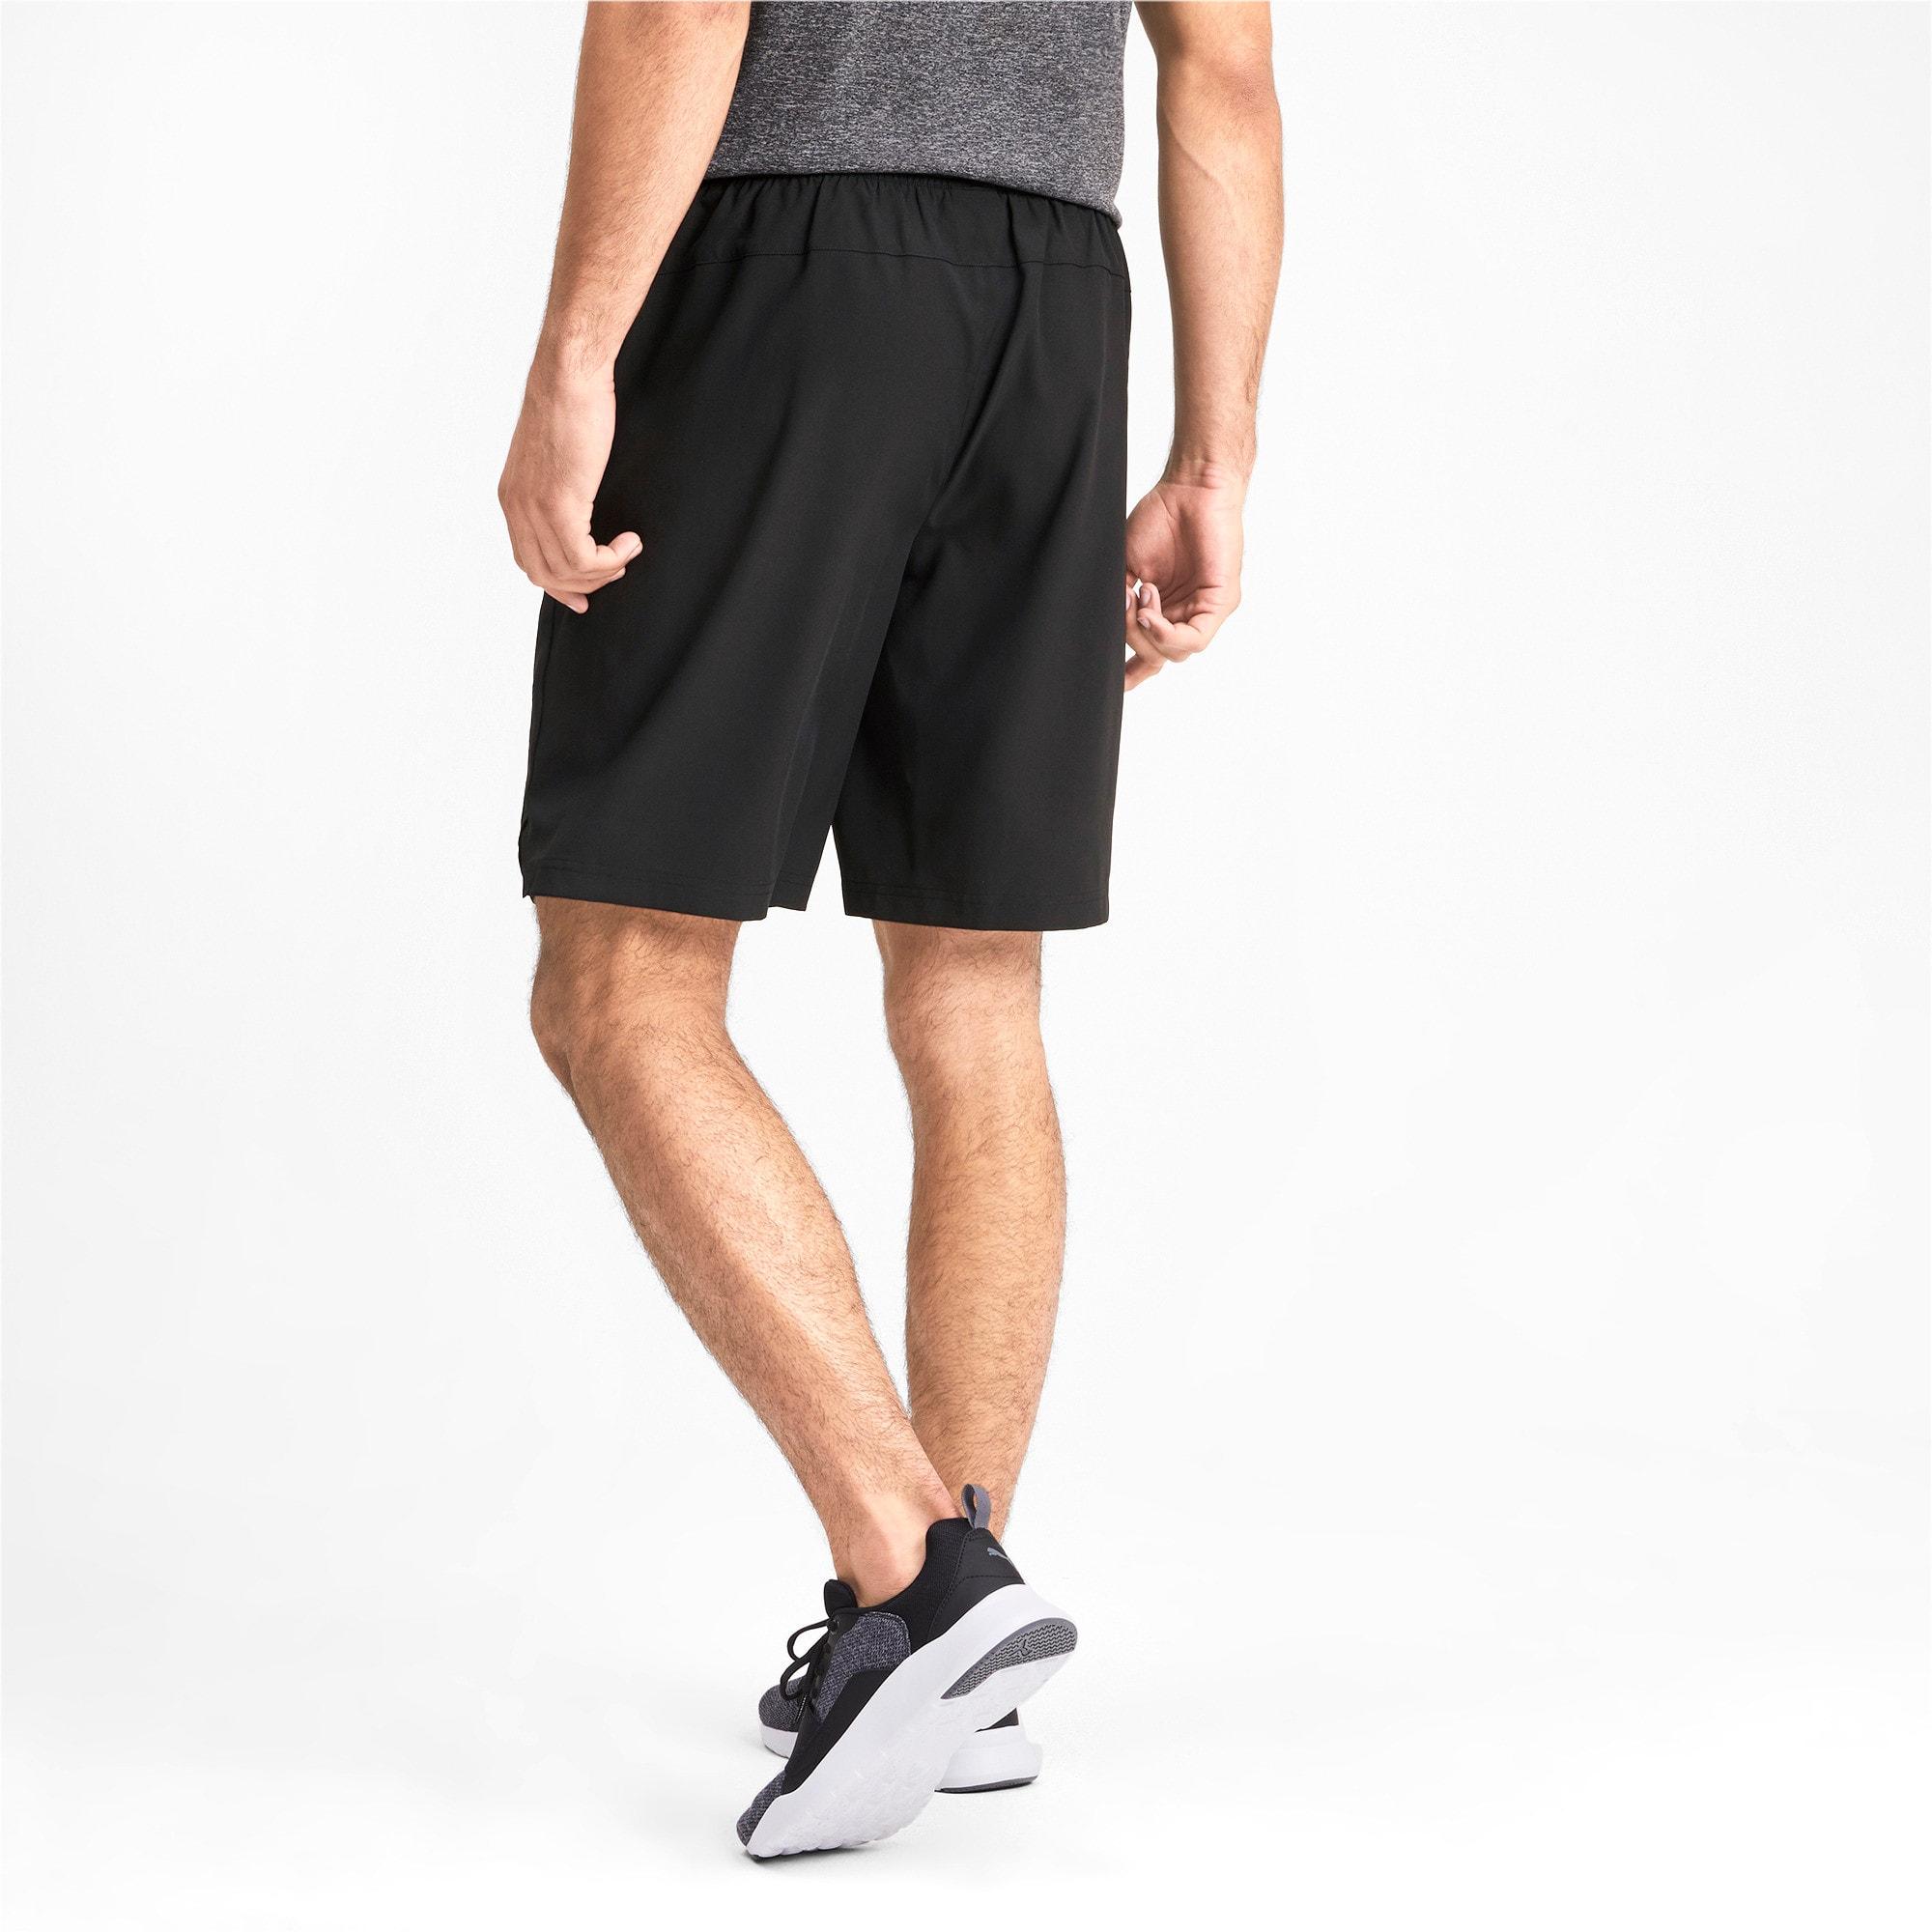 Thumbnail 2 of Tec Sports Men's Woven Shorts, Puma Black, medium-IND